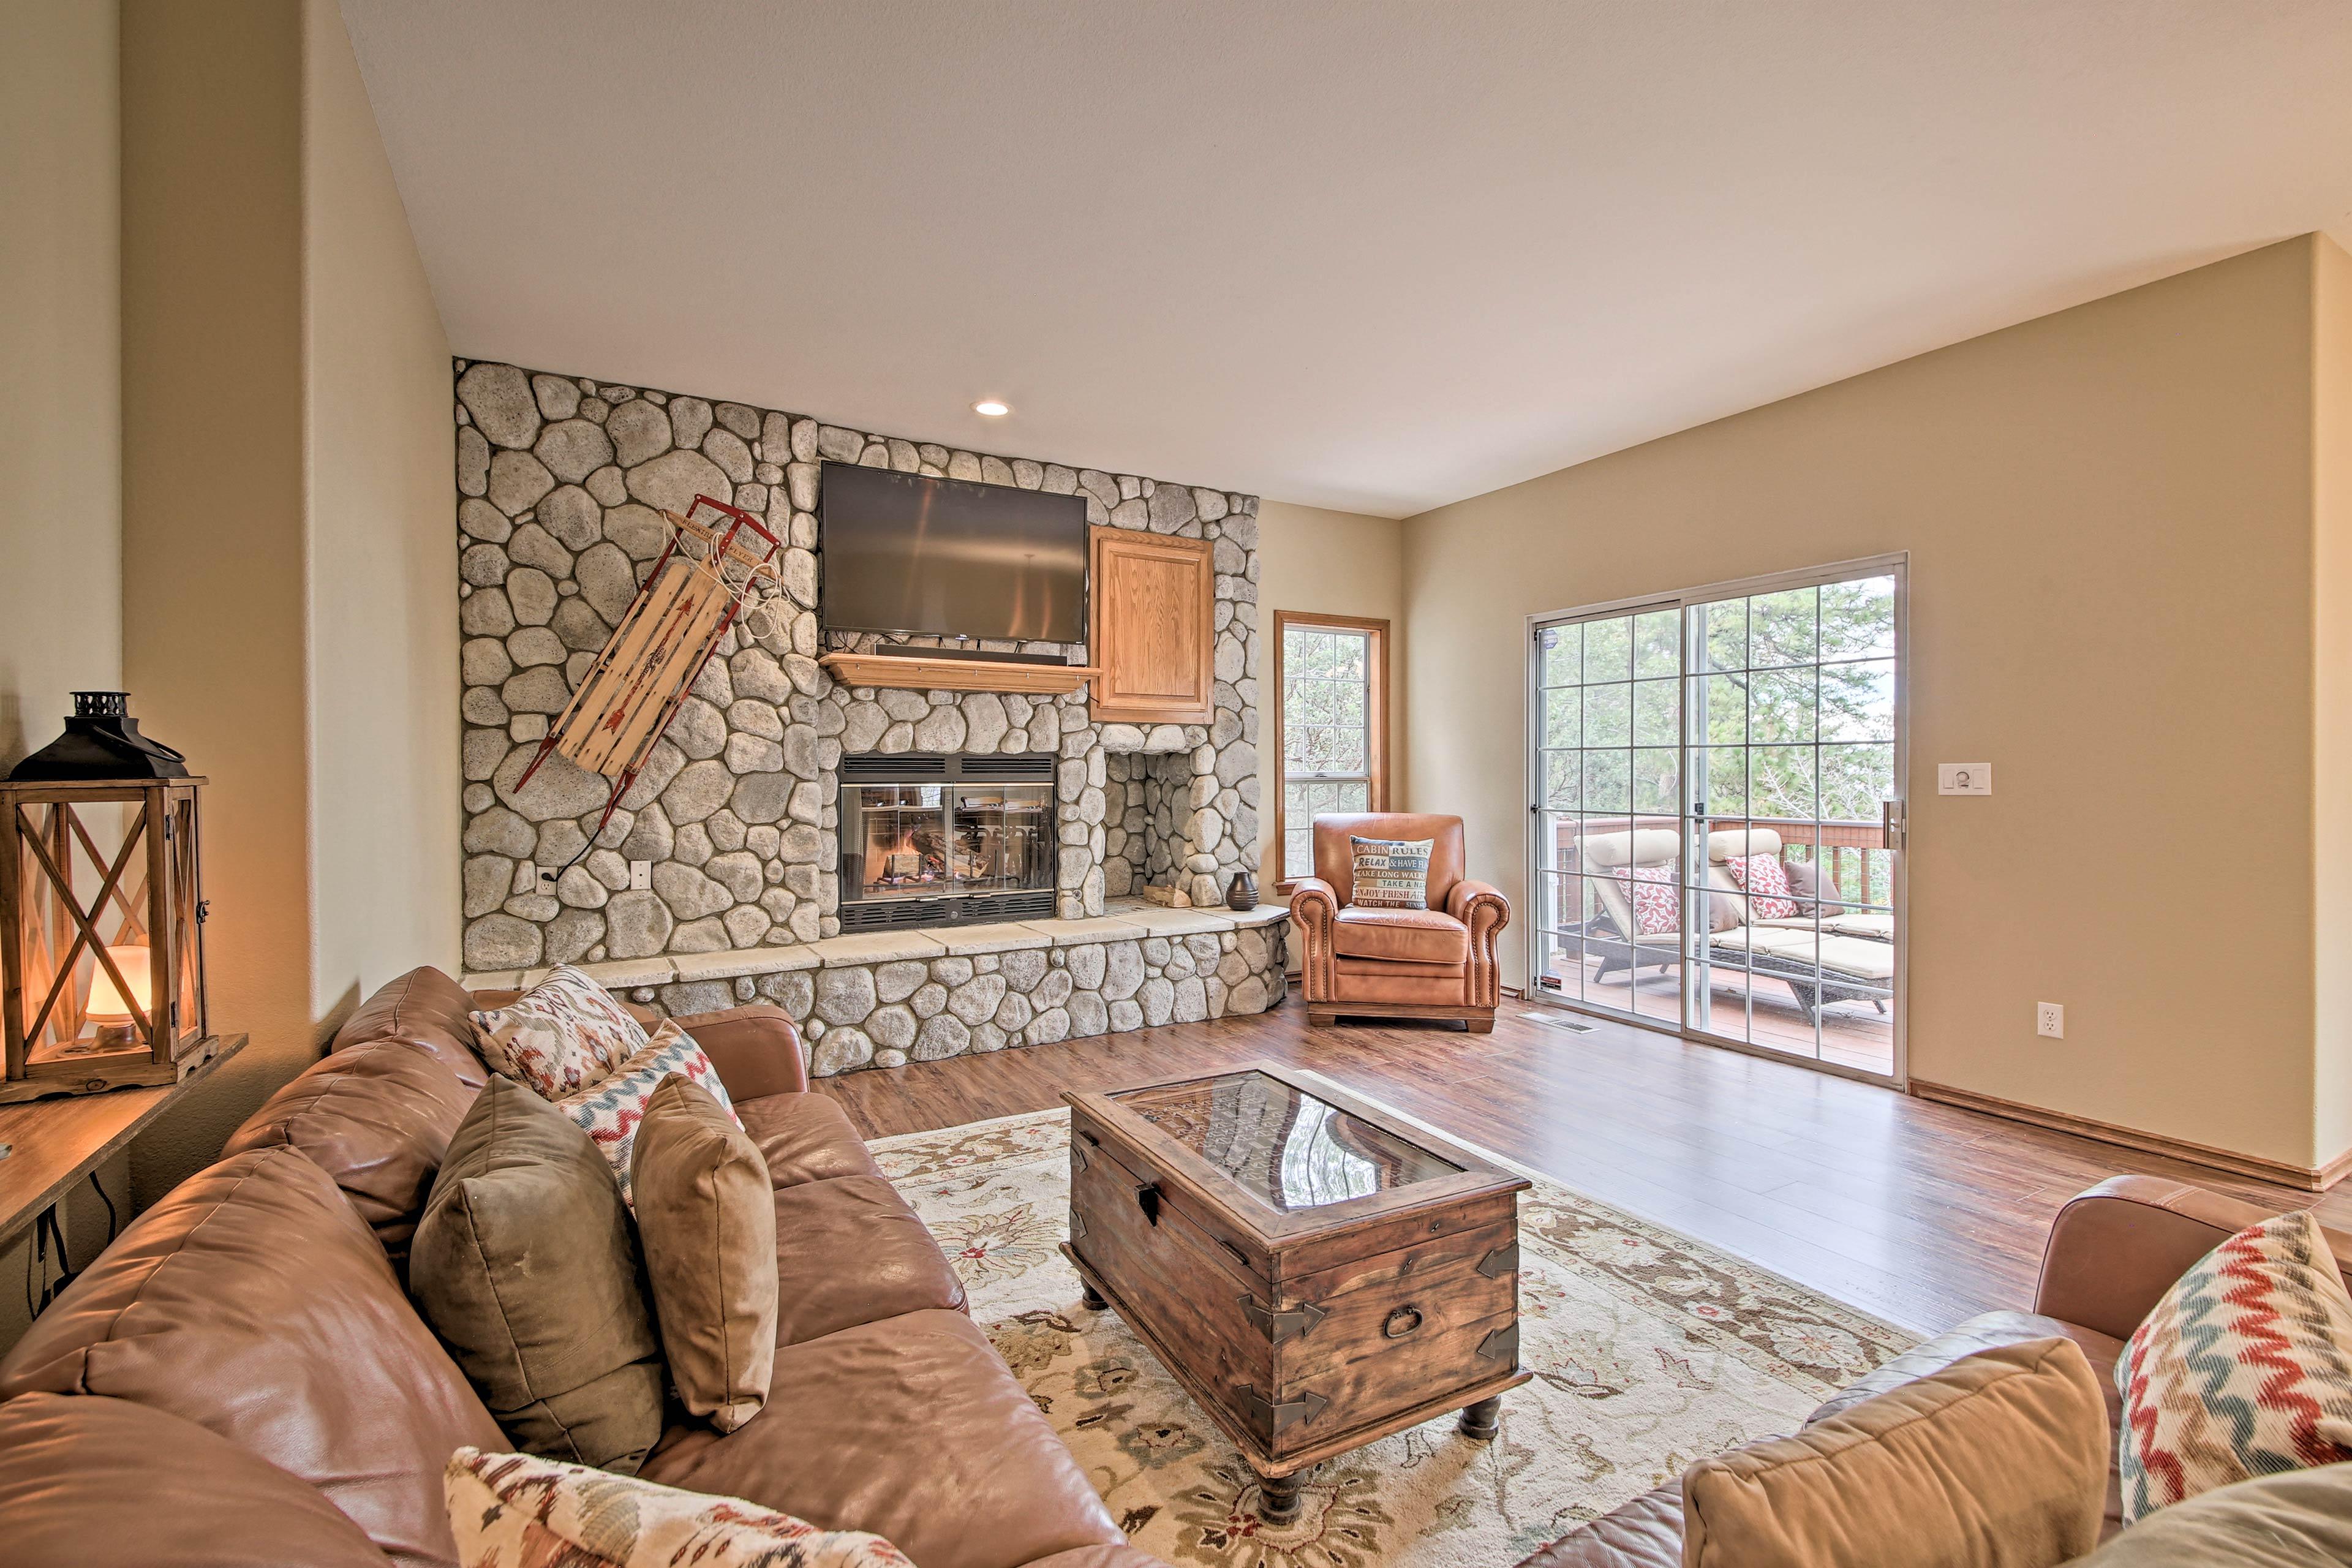 Lake Arrowhead Vacation Rental House   4BR   3.5BA   12 Guests   4,350 Sq Ft